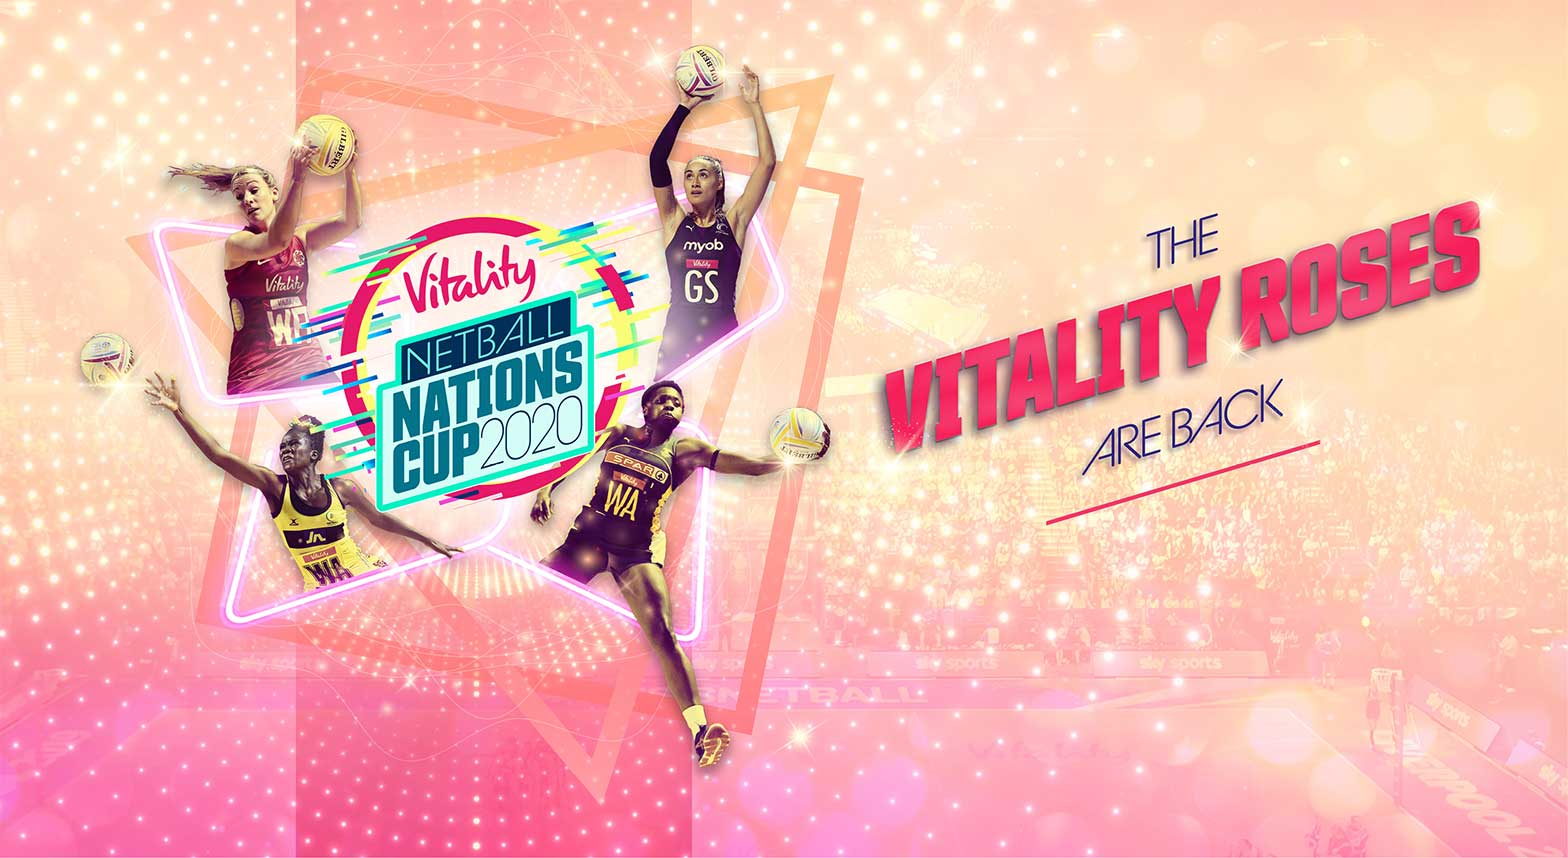 vitality-netball-nations-cup.jpg